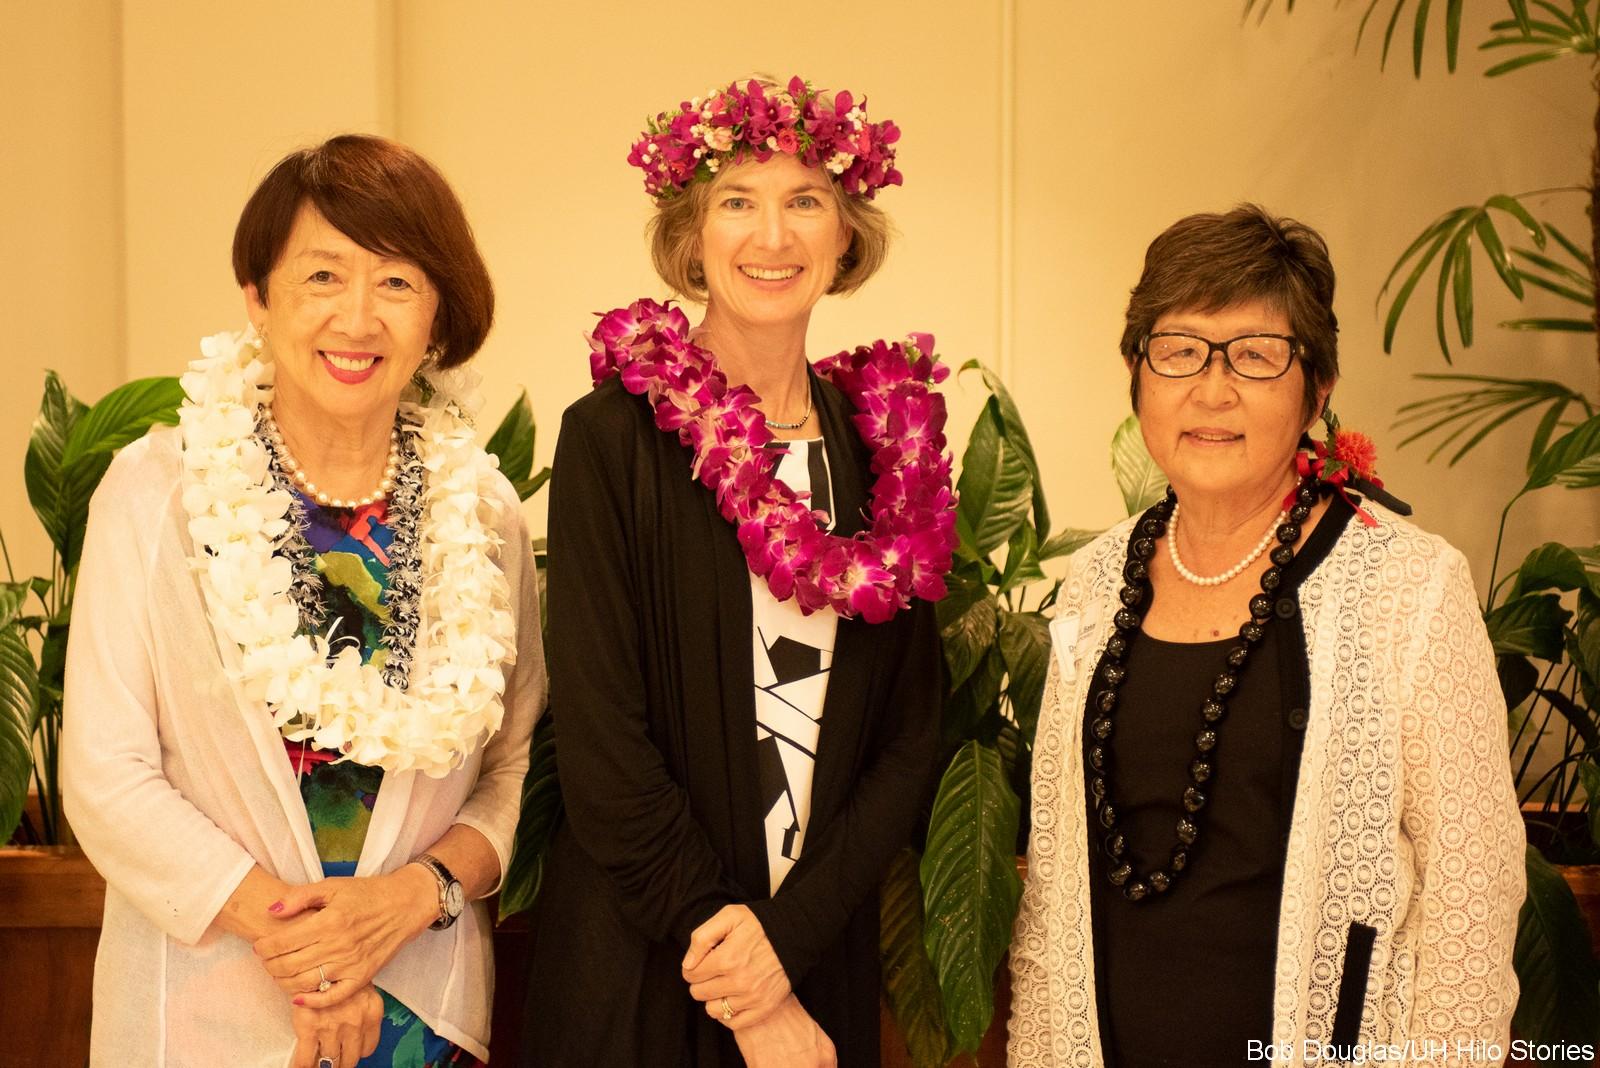 Rose Tseng, Jennifer Doudna, and Marcia Sakai stand for photo.